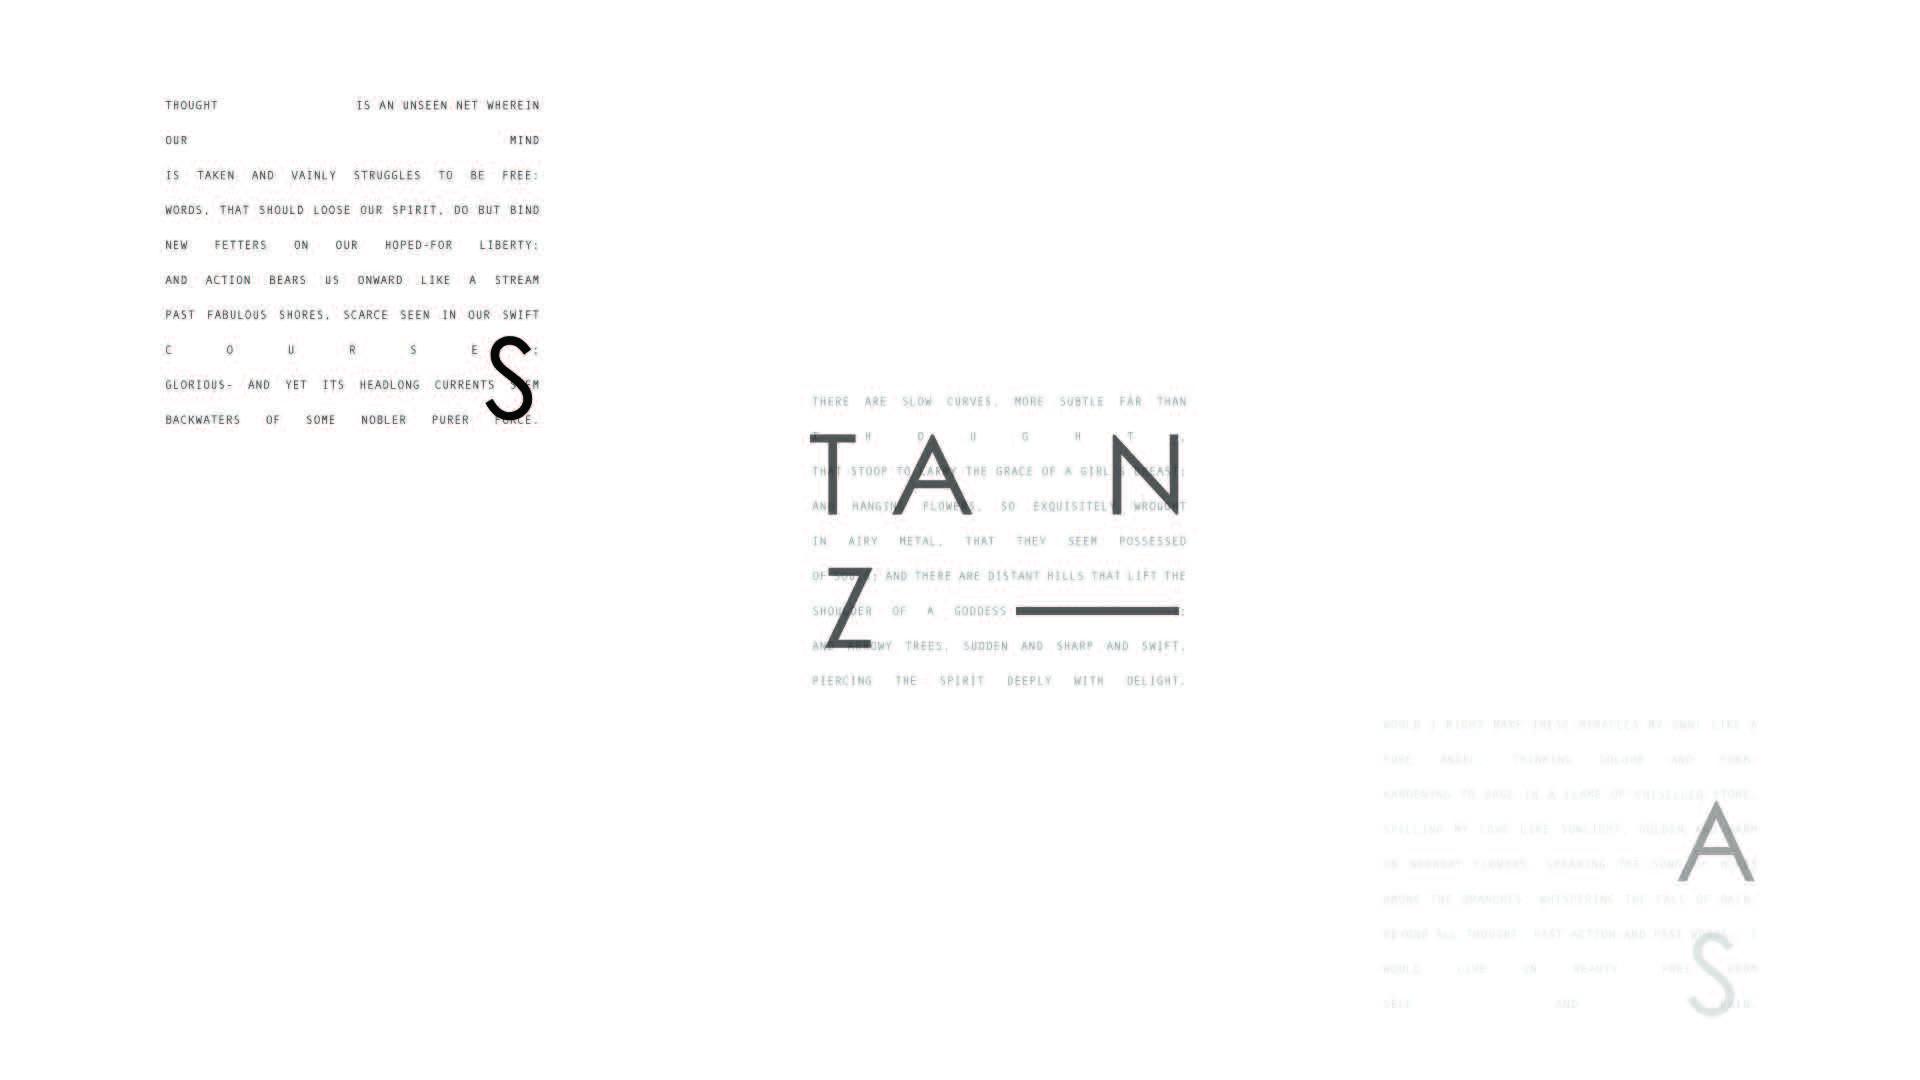 Stanzas_progress1_0330.jpg